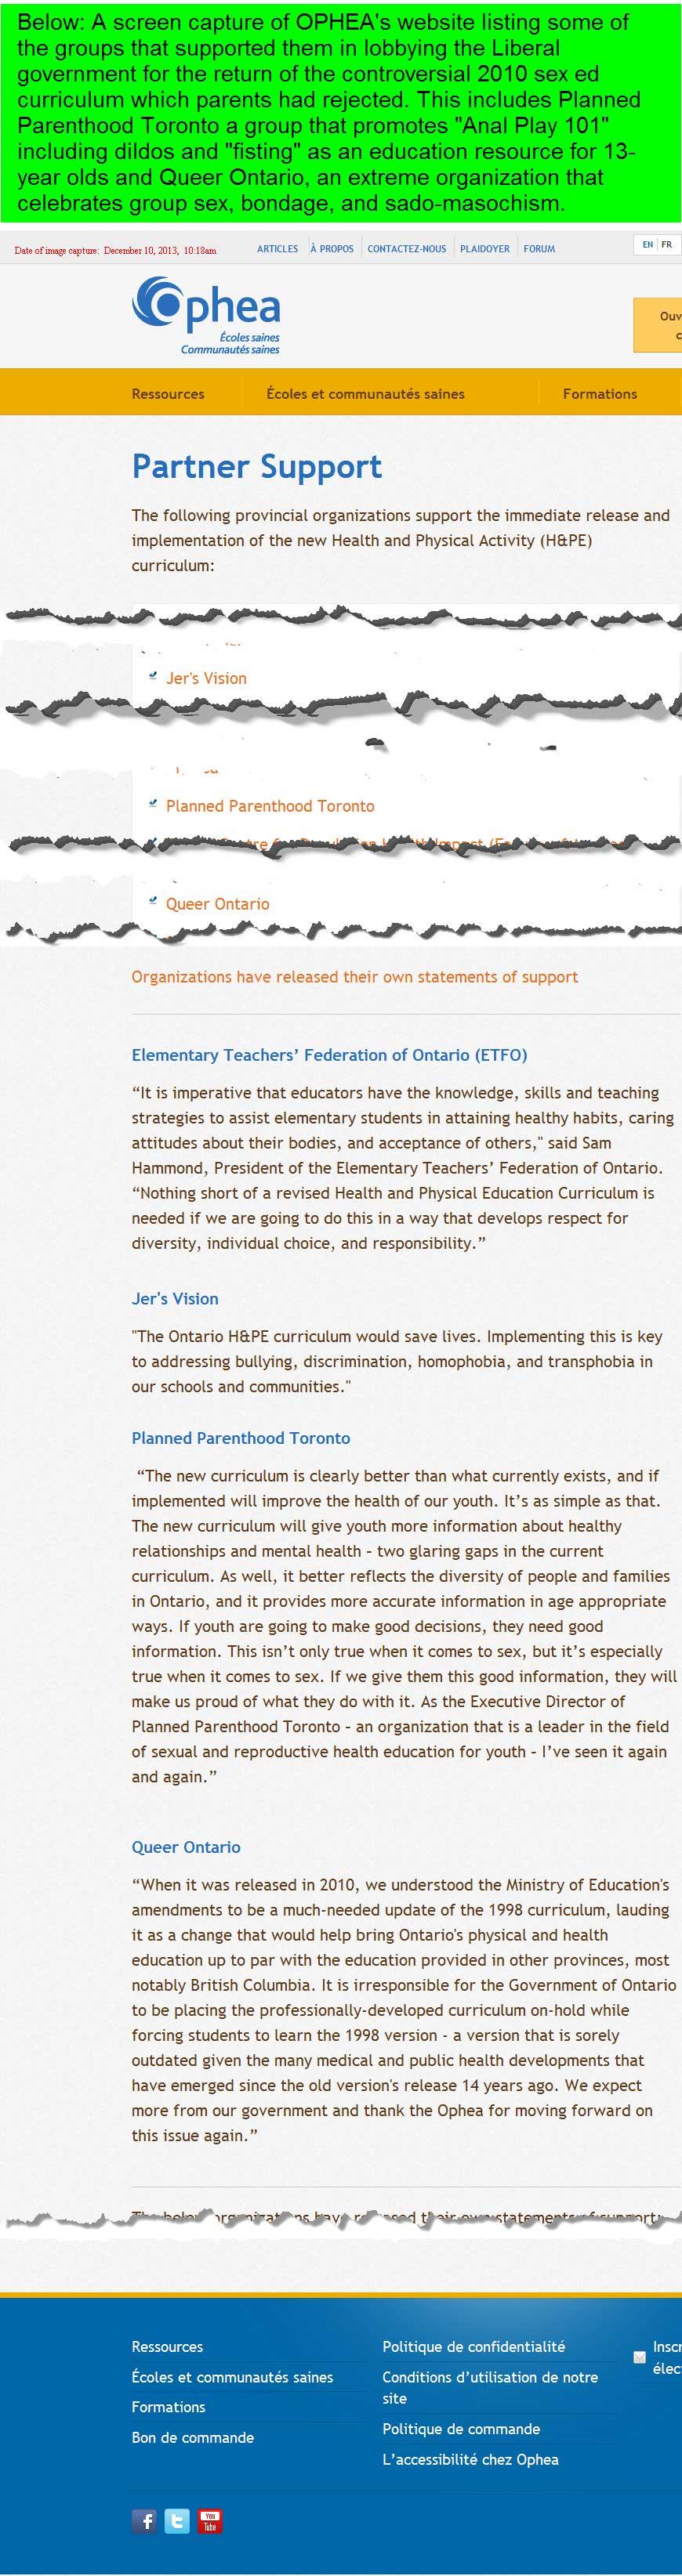 Sex education in the curriculum